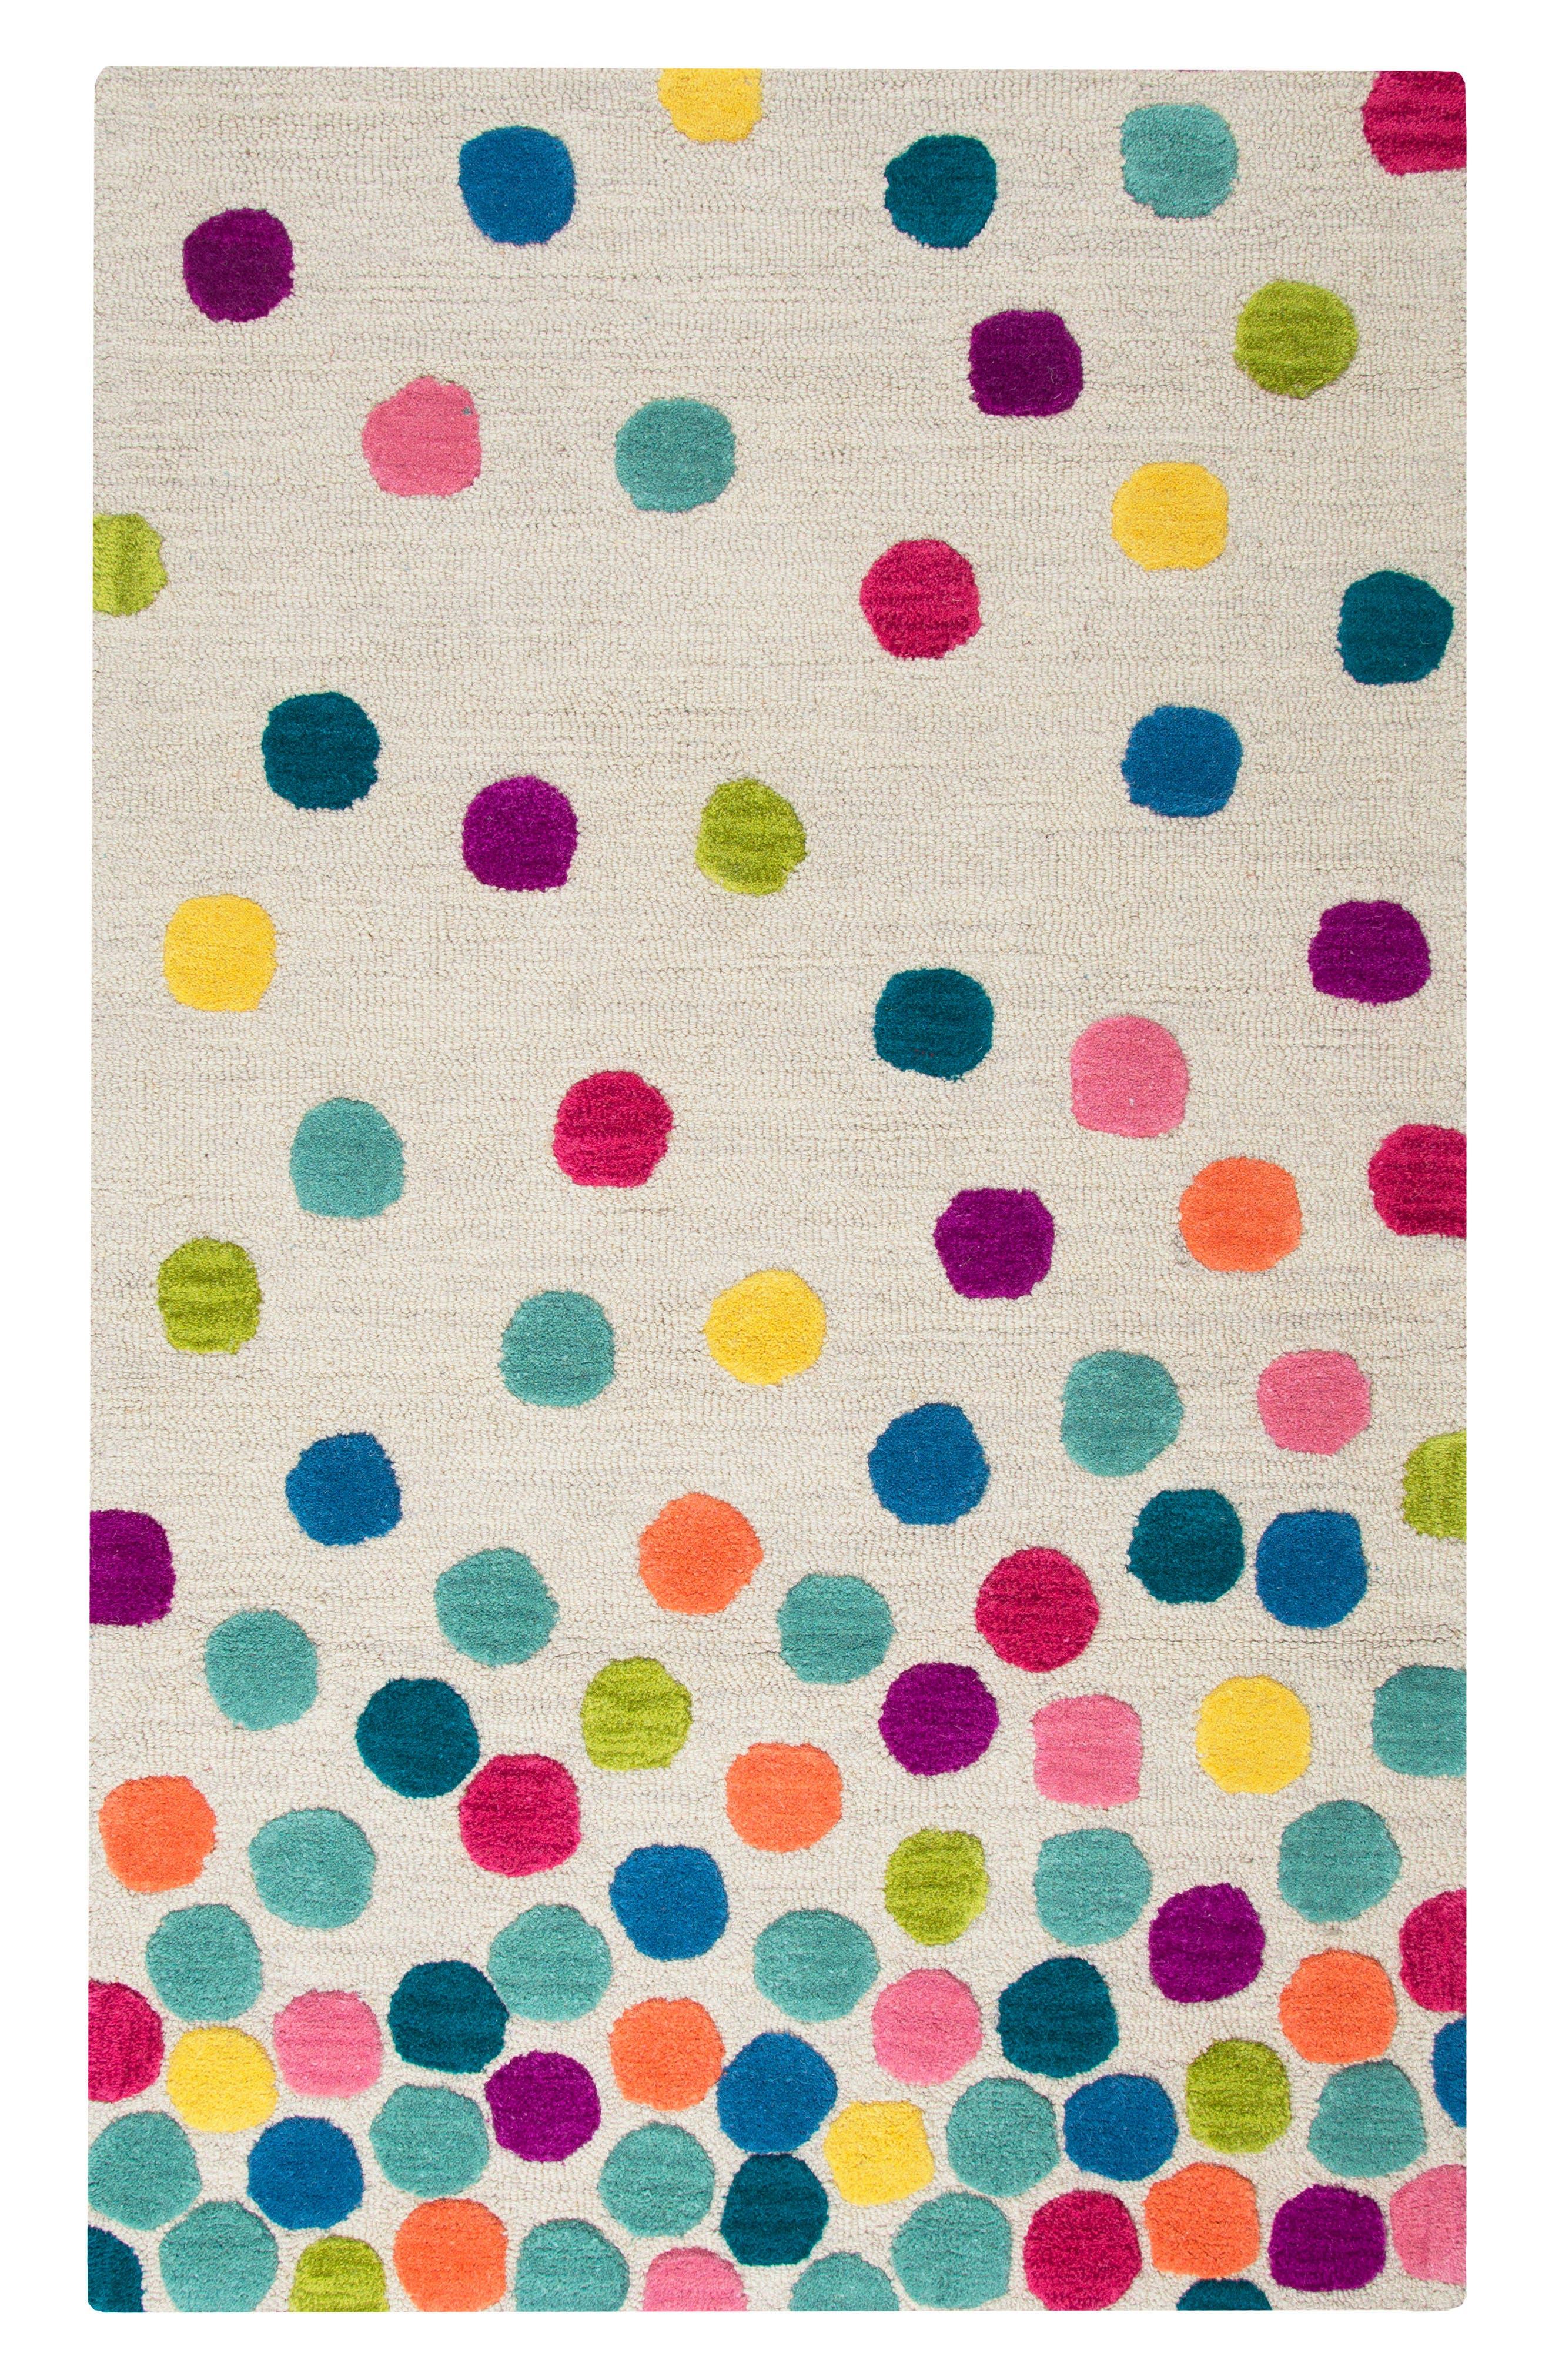 Play Day Crazy Dots Rug,                             Main thumbnail 1, color,                             Ivory